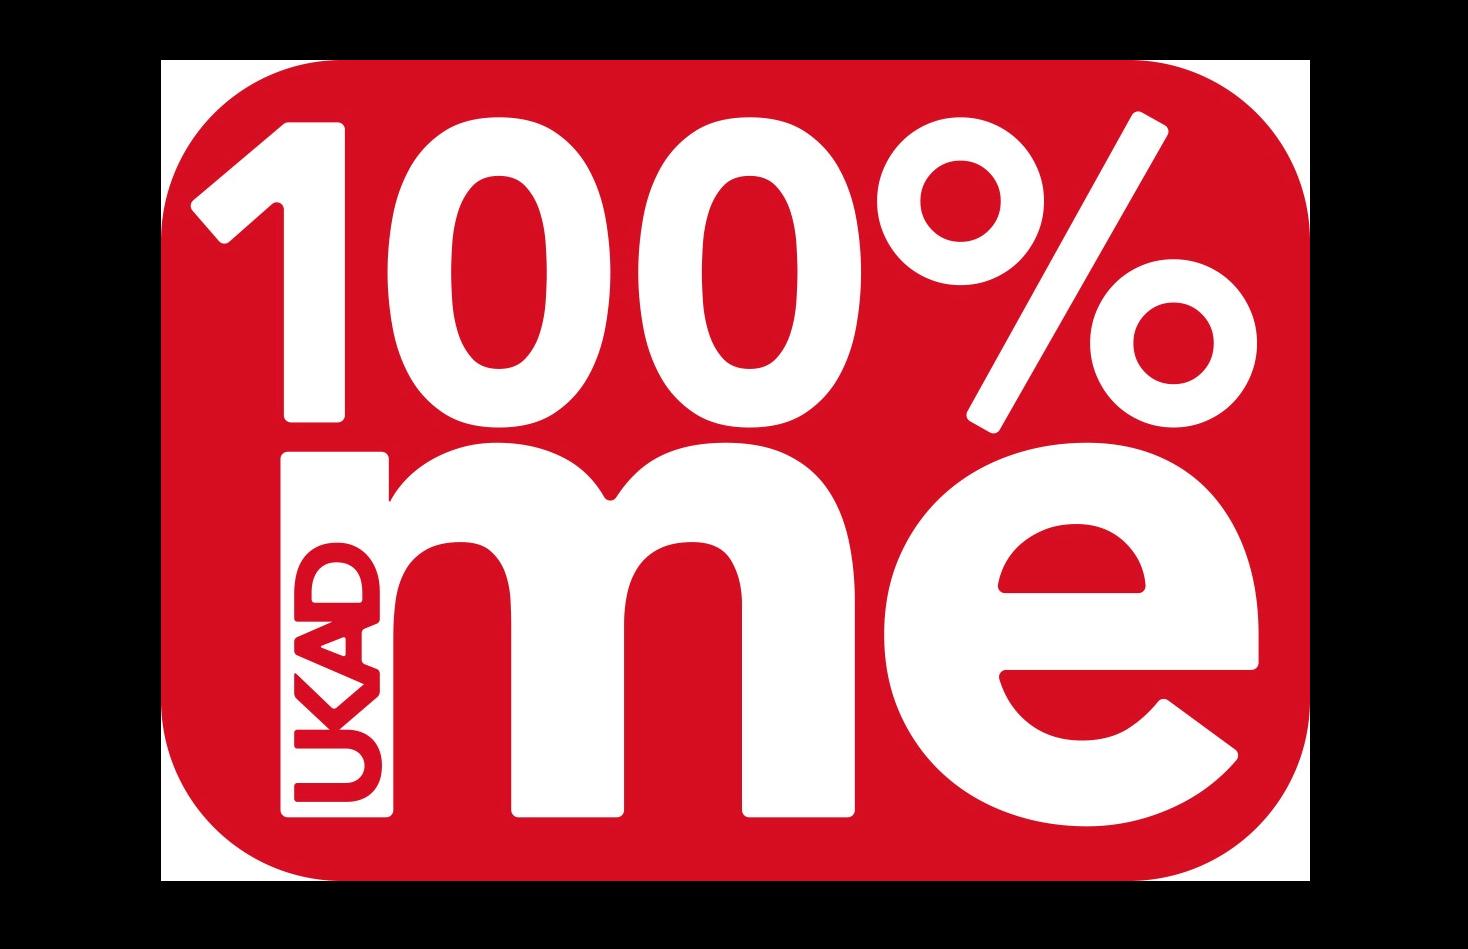 100 me logo - UKAD's education programme